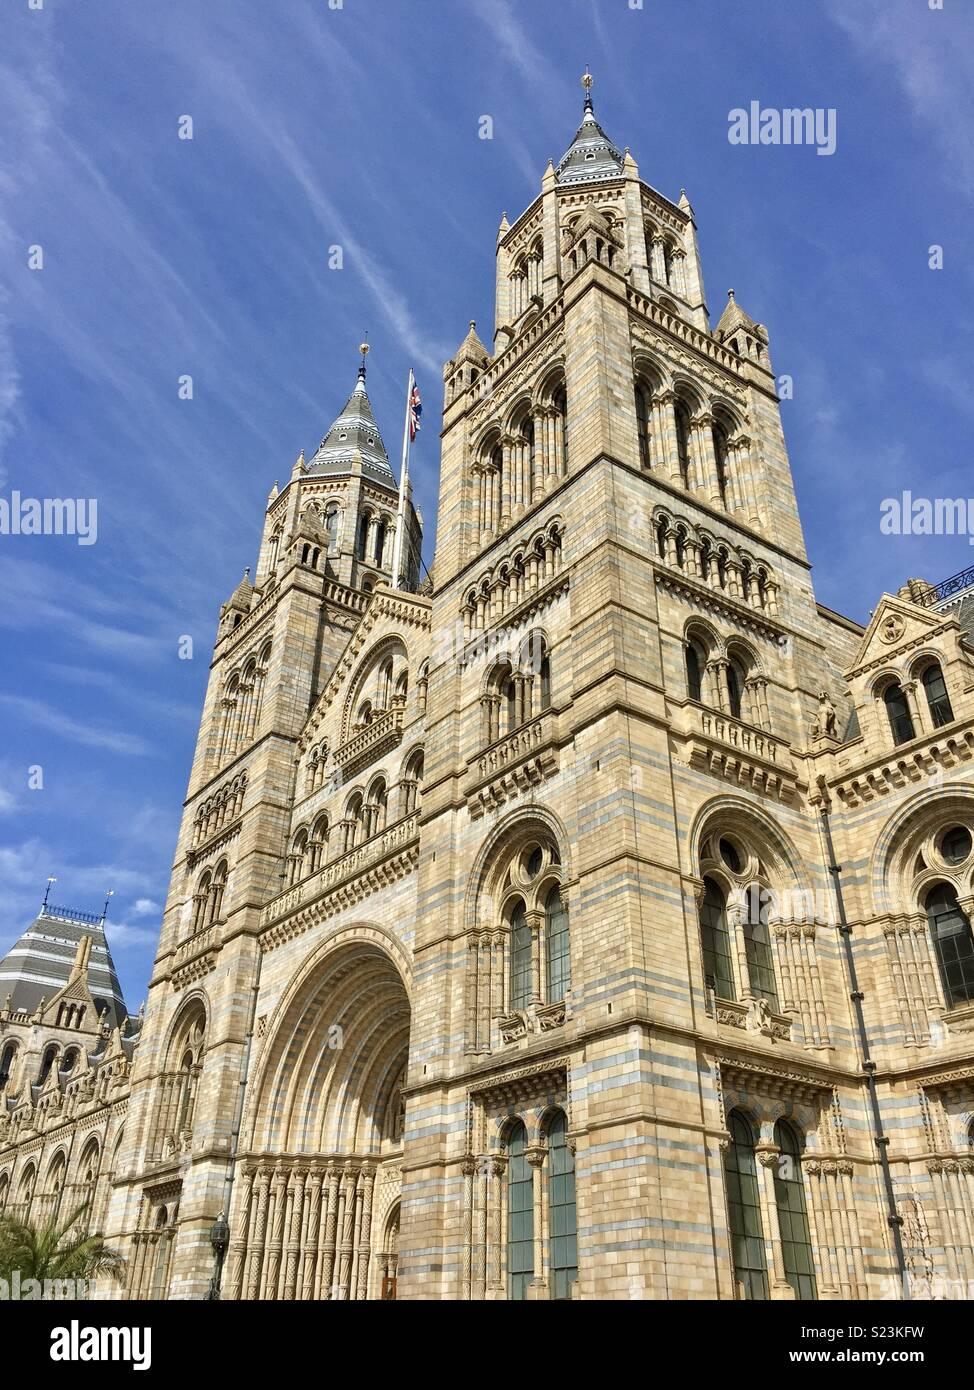 Natural History Museum London - Stock Image